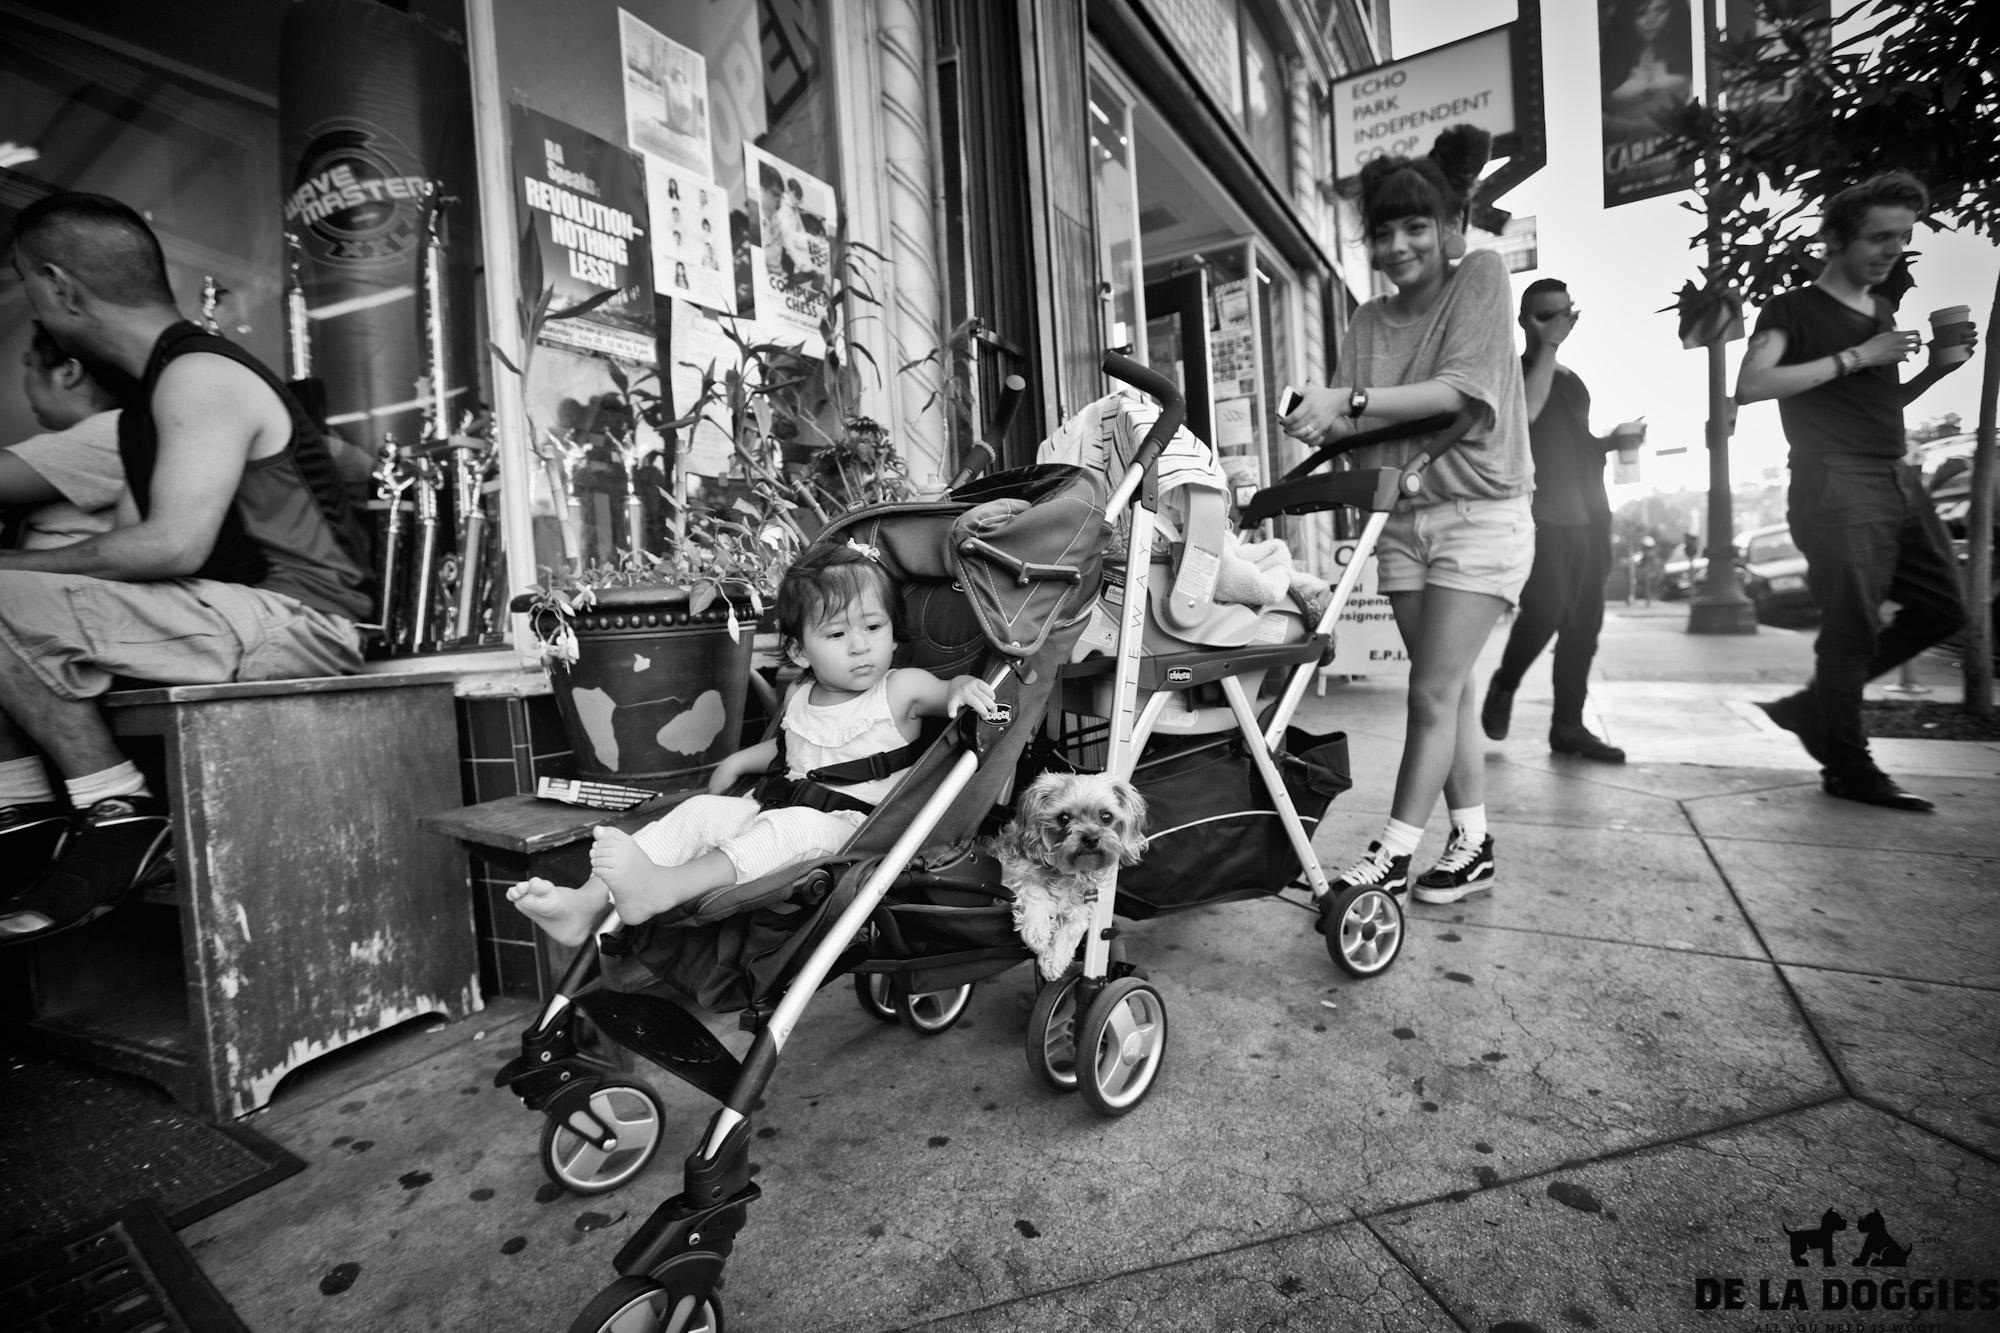 Familia - Sunset Blvd., Echo Park